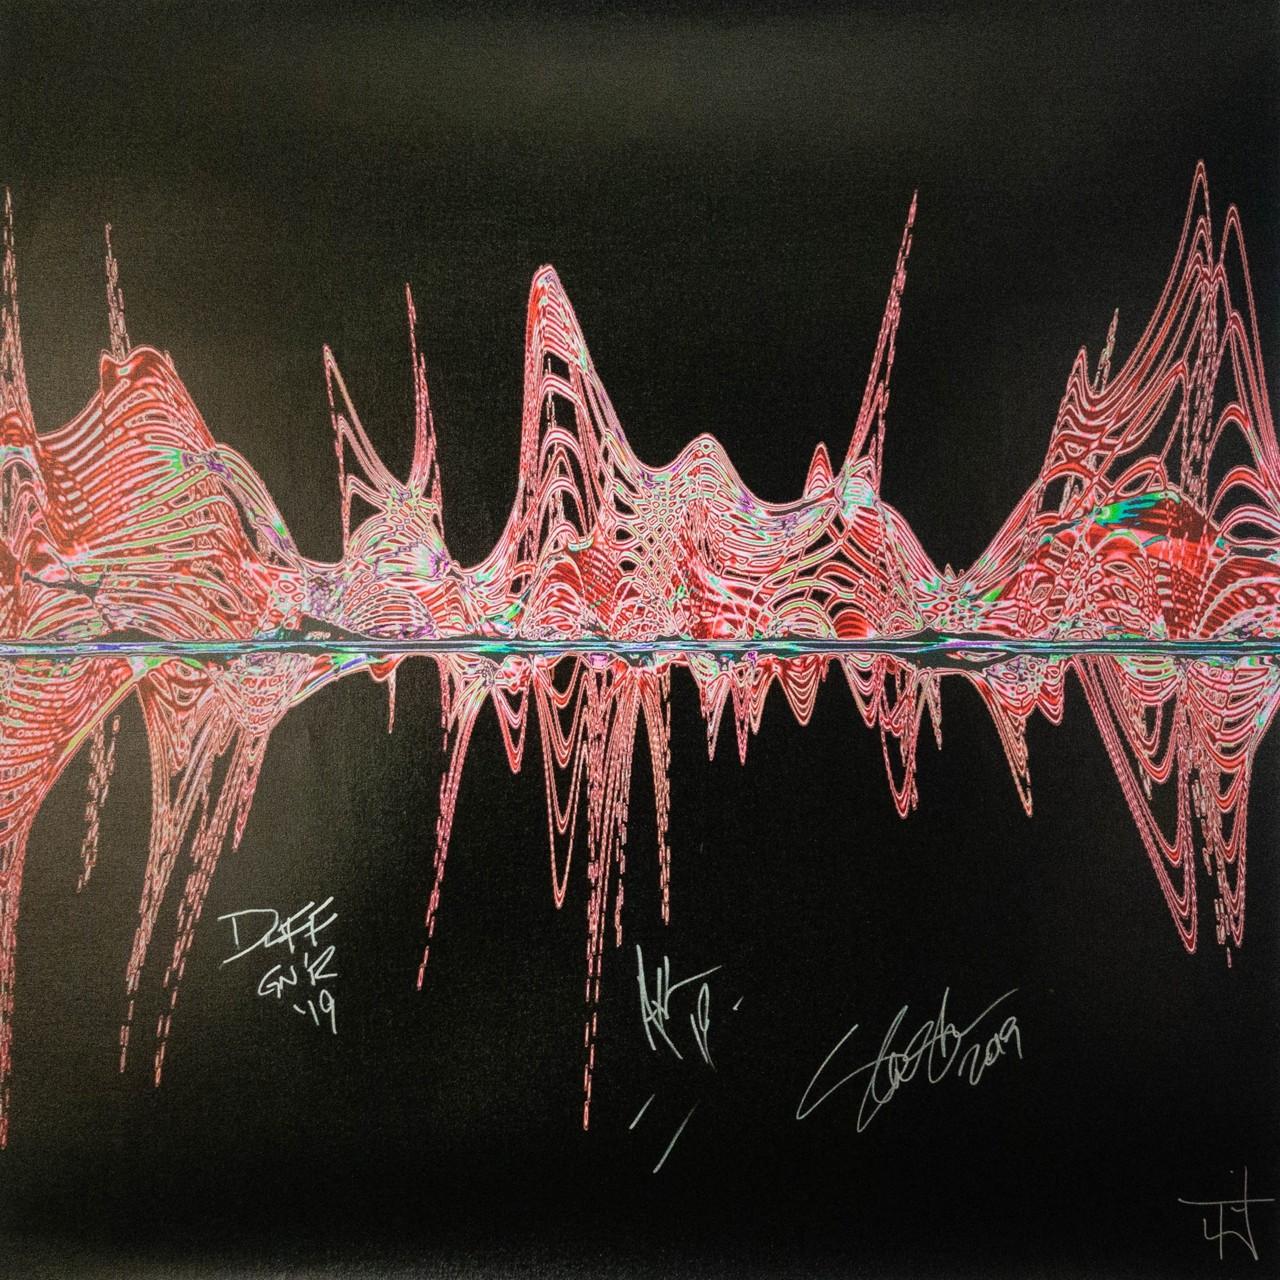 Guns N Roses с песней Welcome To The Jungle в художественном проекте Sound Art Foundation